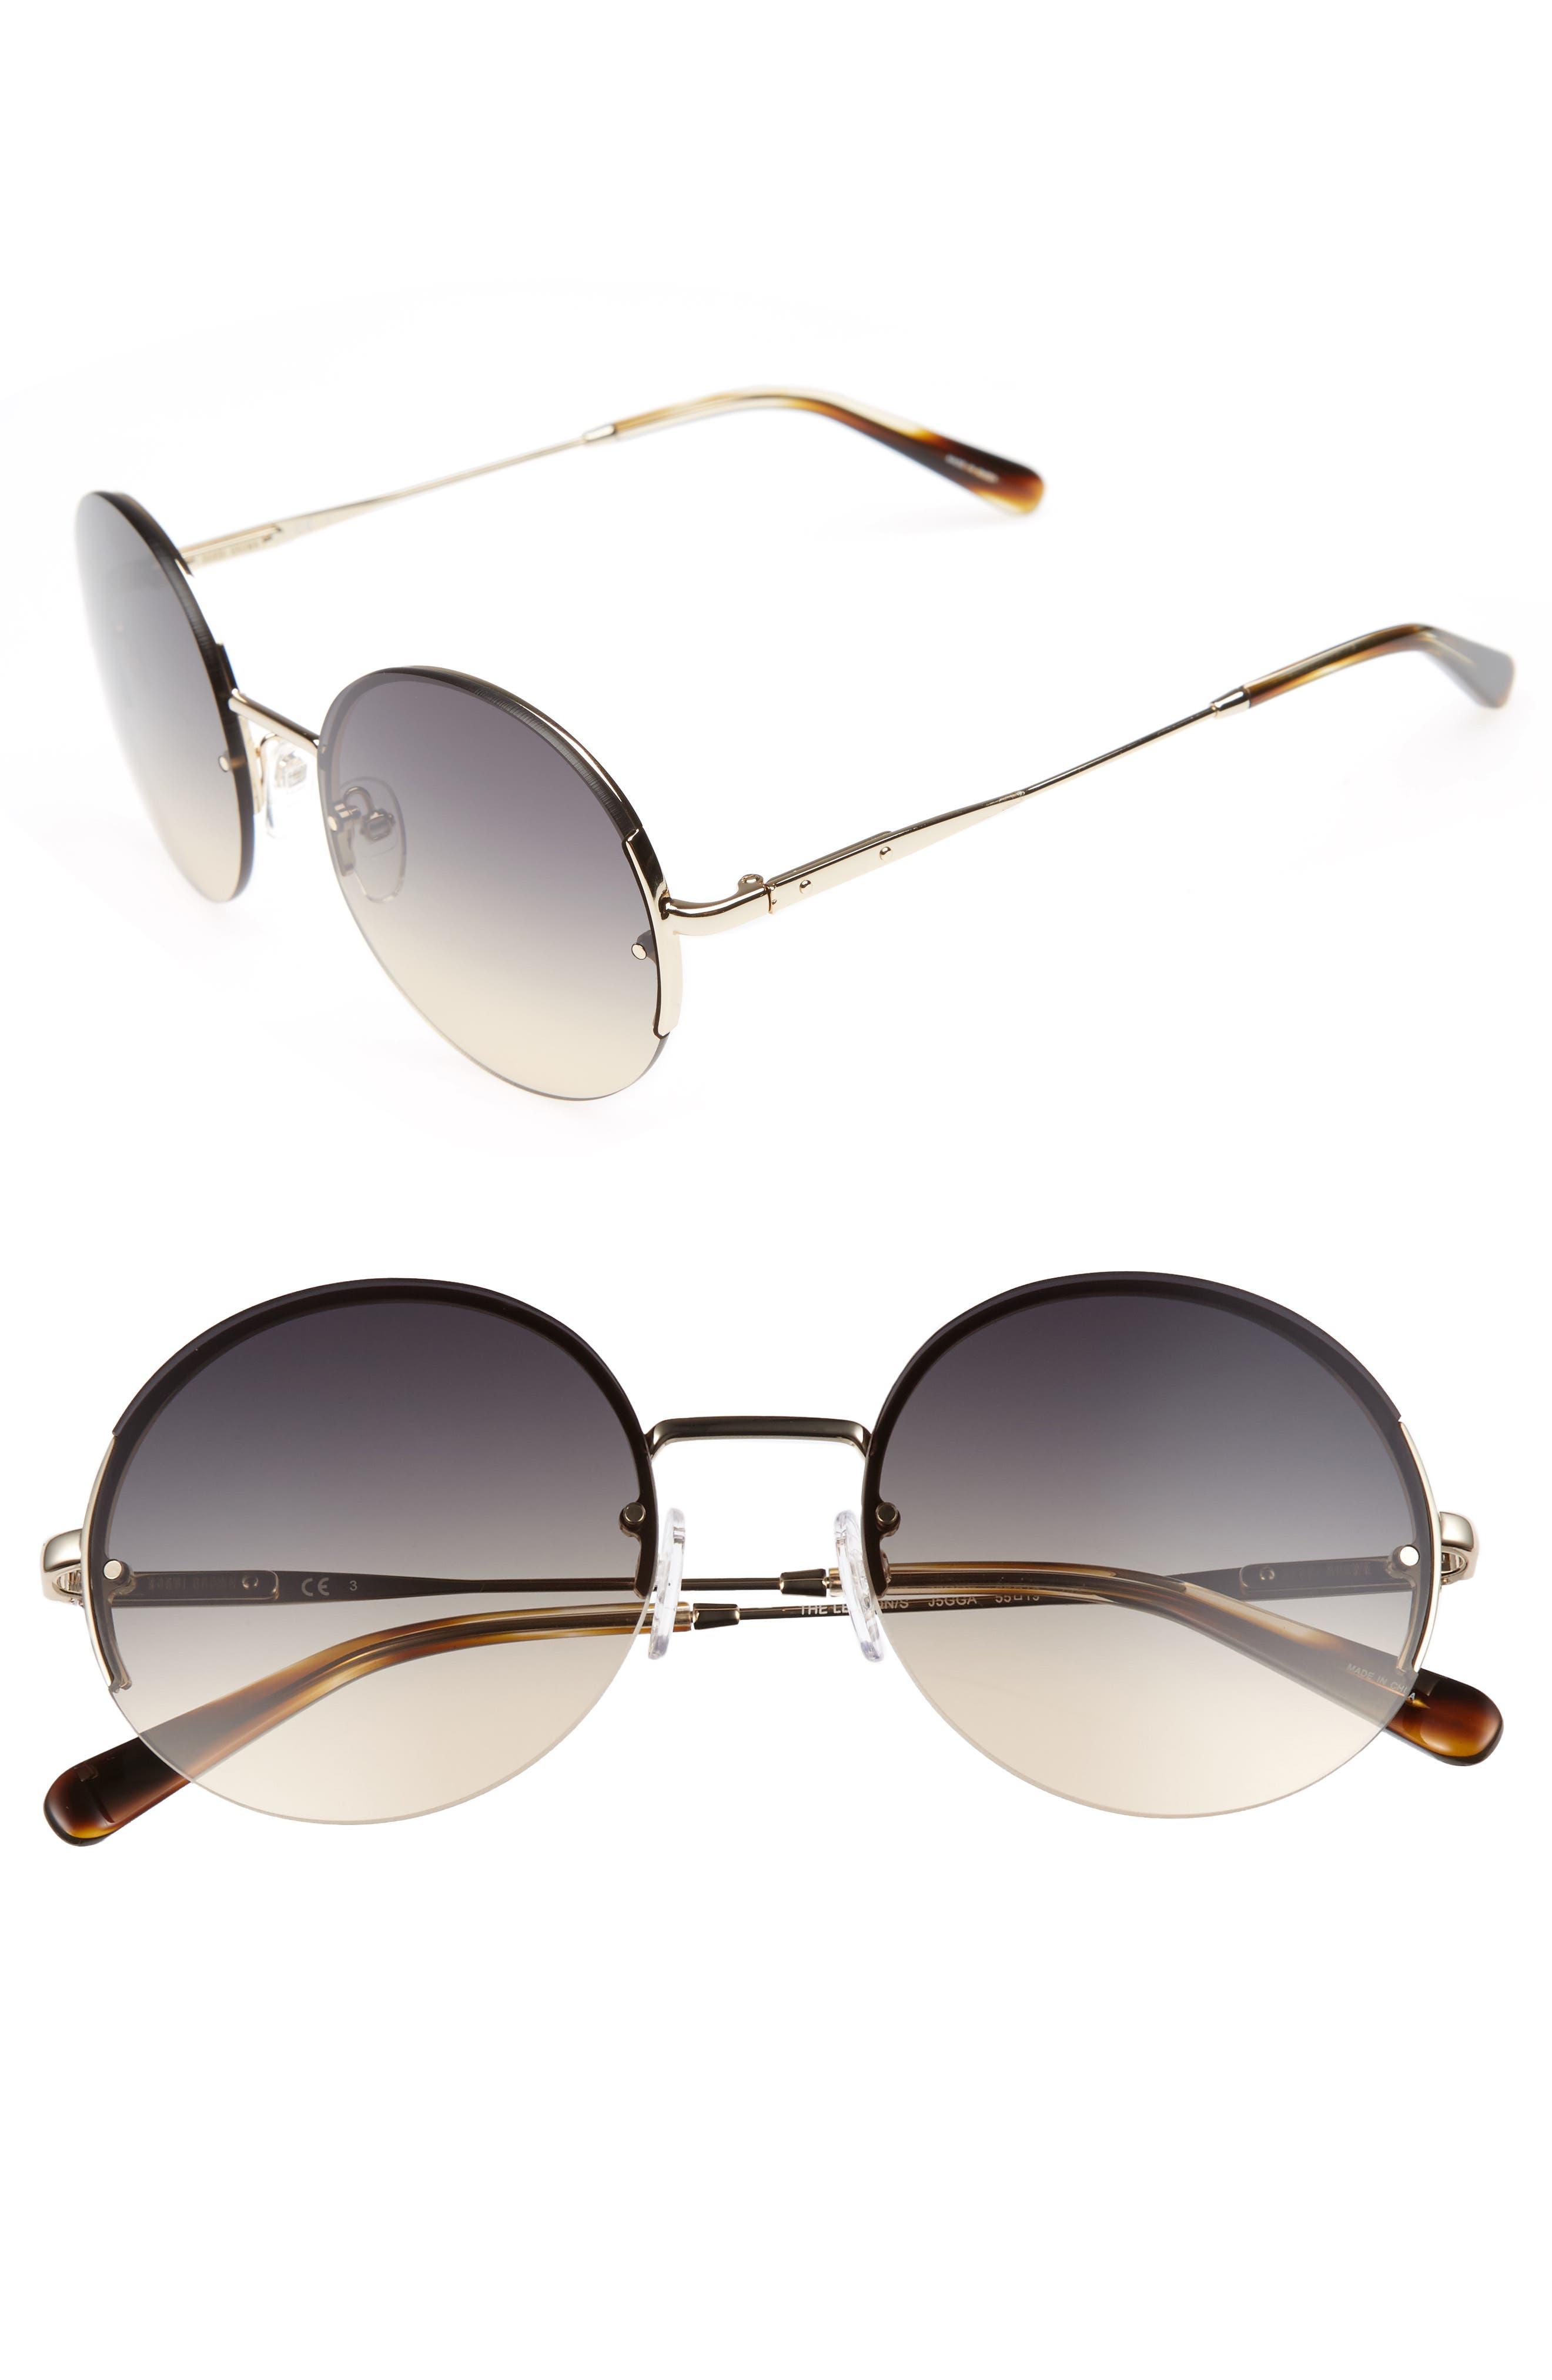 55mm Round Sunglasses,                             Main thumbnail 1, color,                             Endura Gold